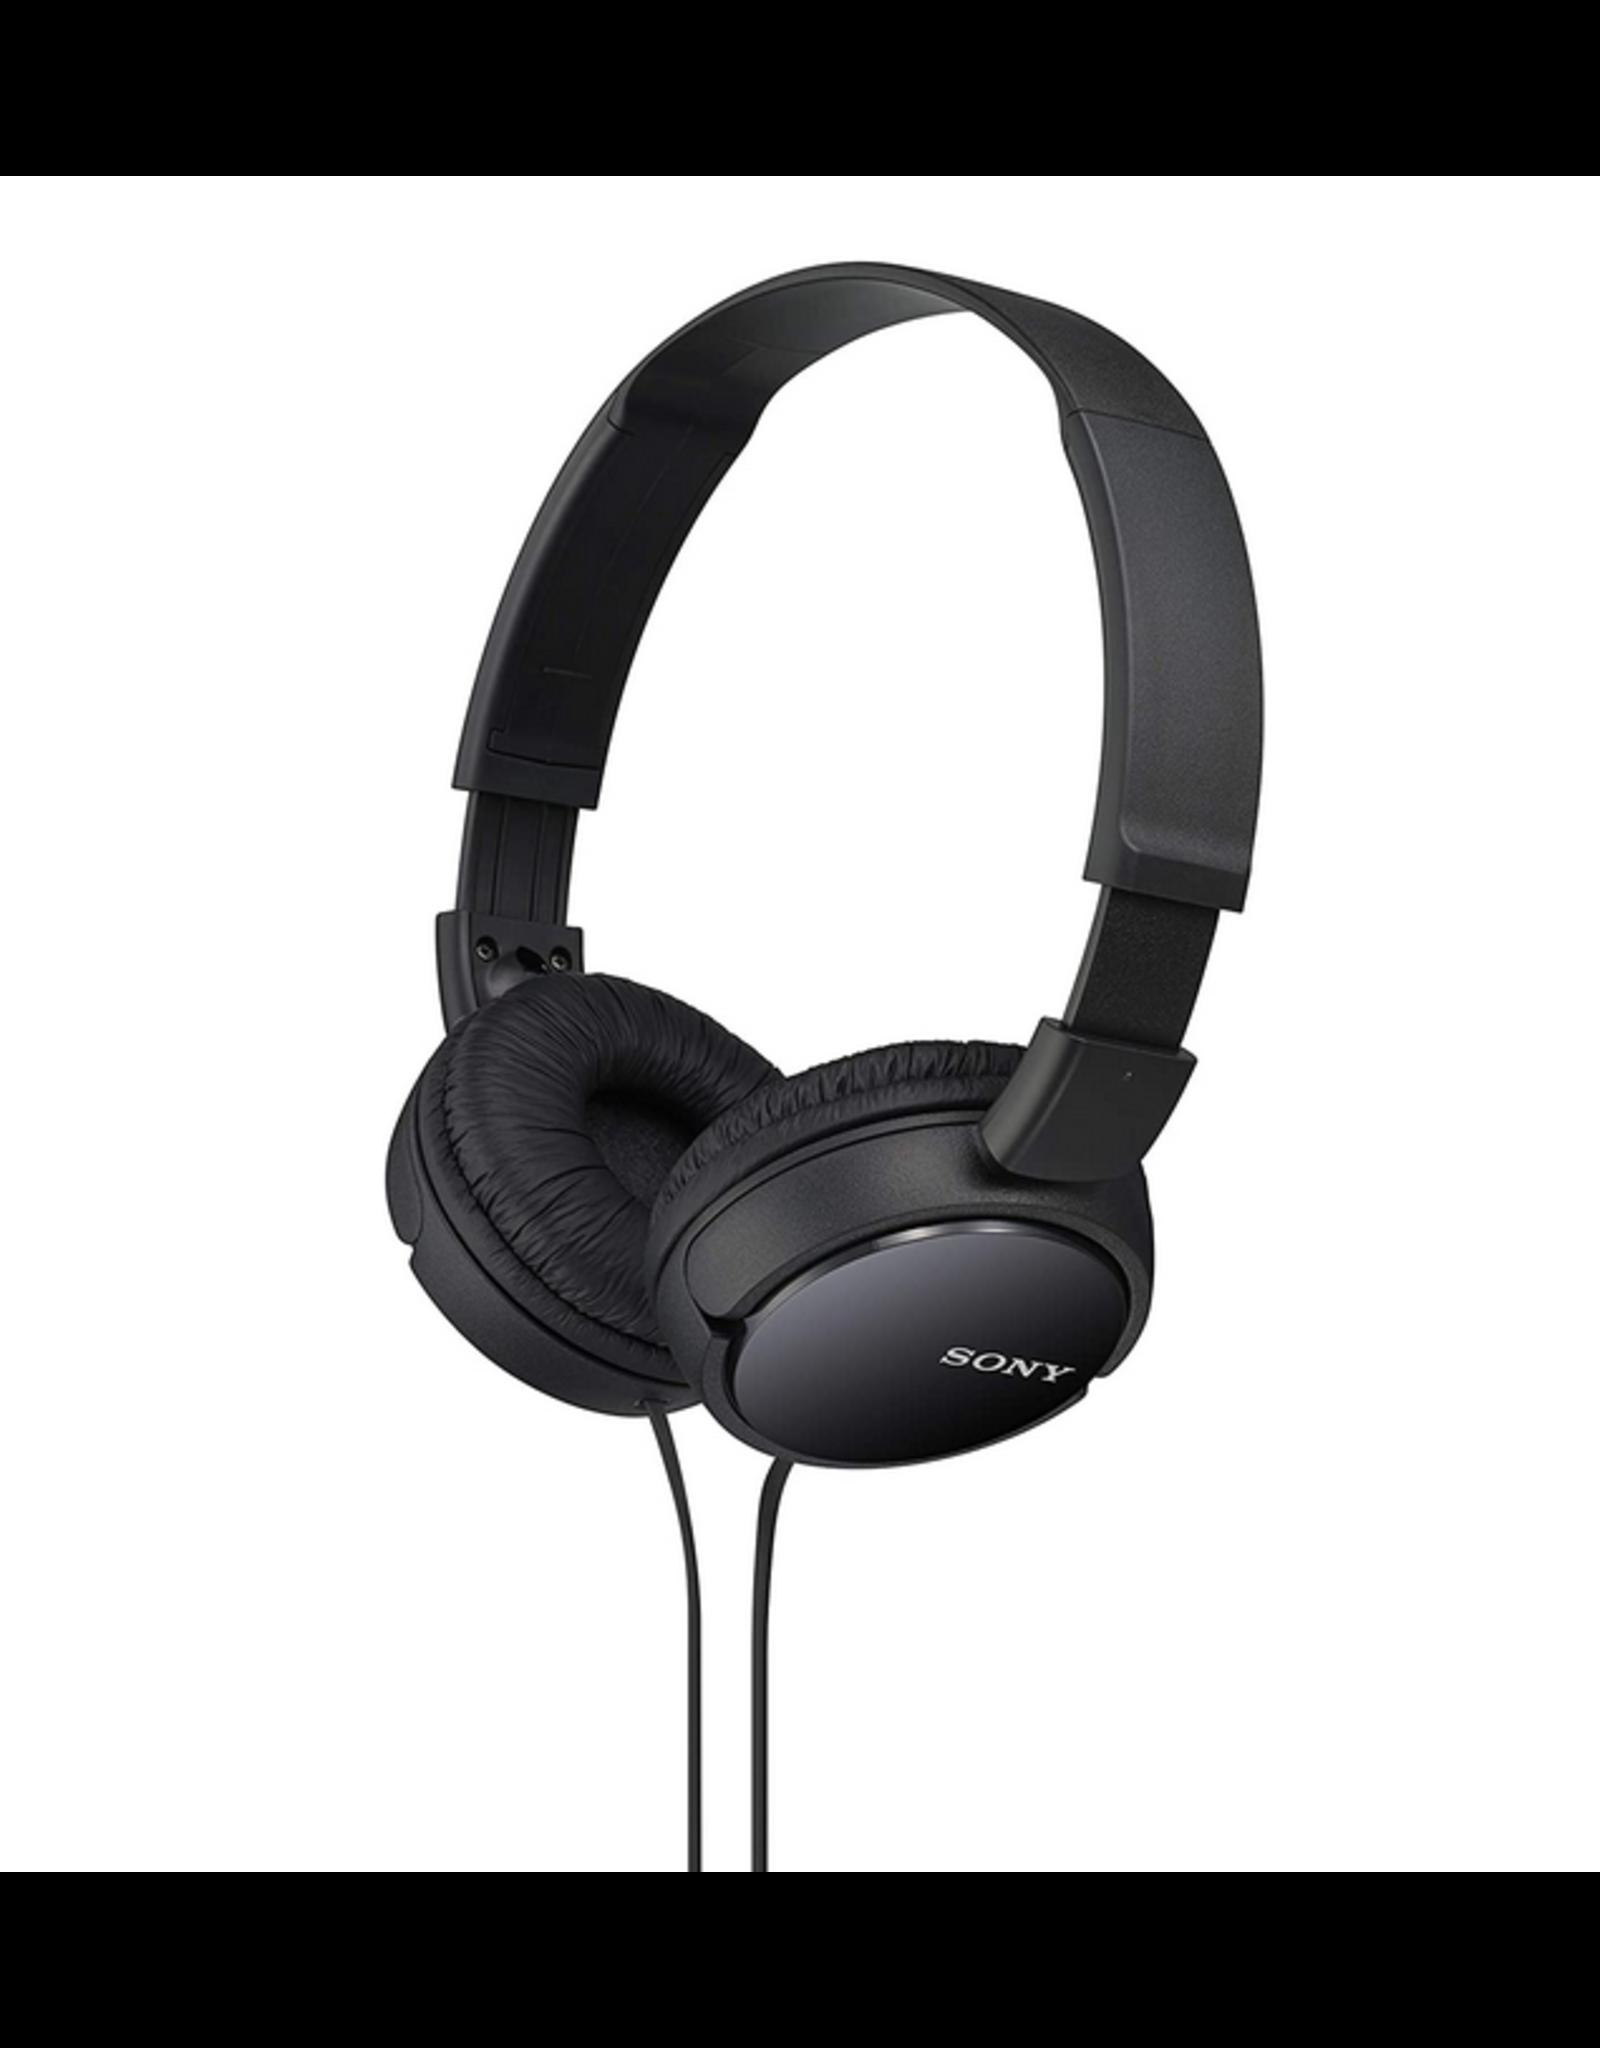 Sony Sony MDRZX110 Over Ear Headphones, Black